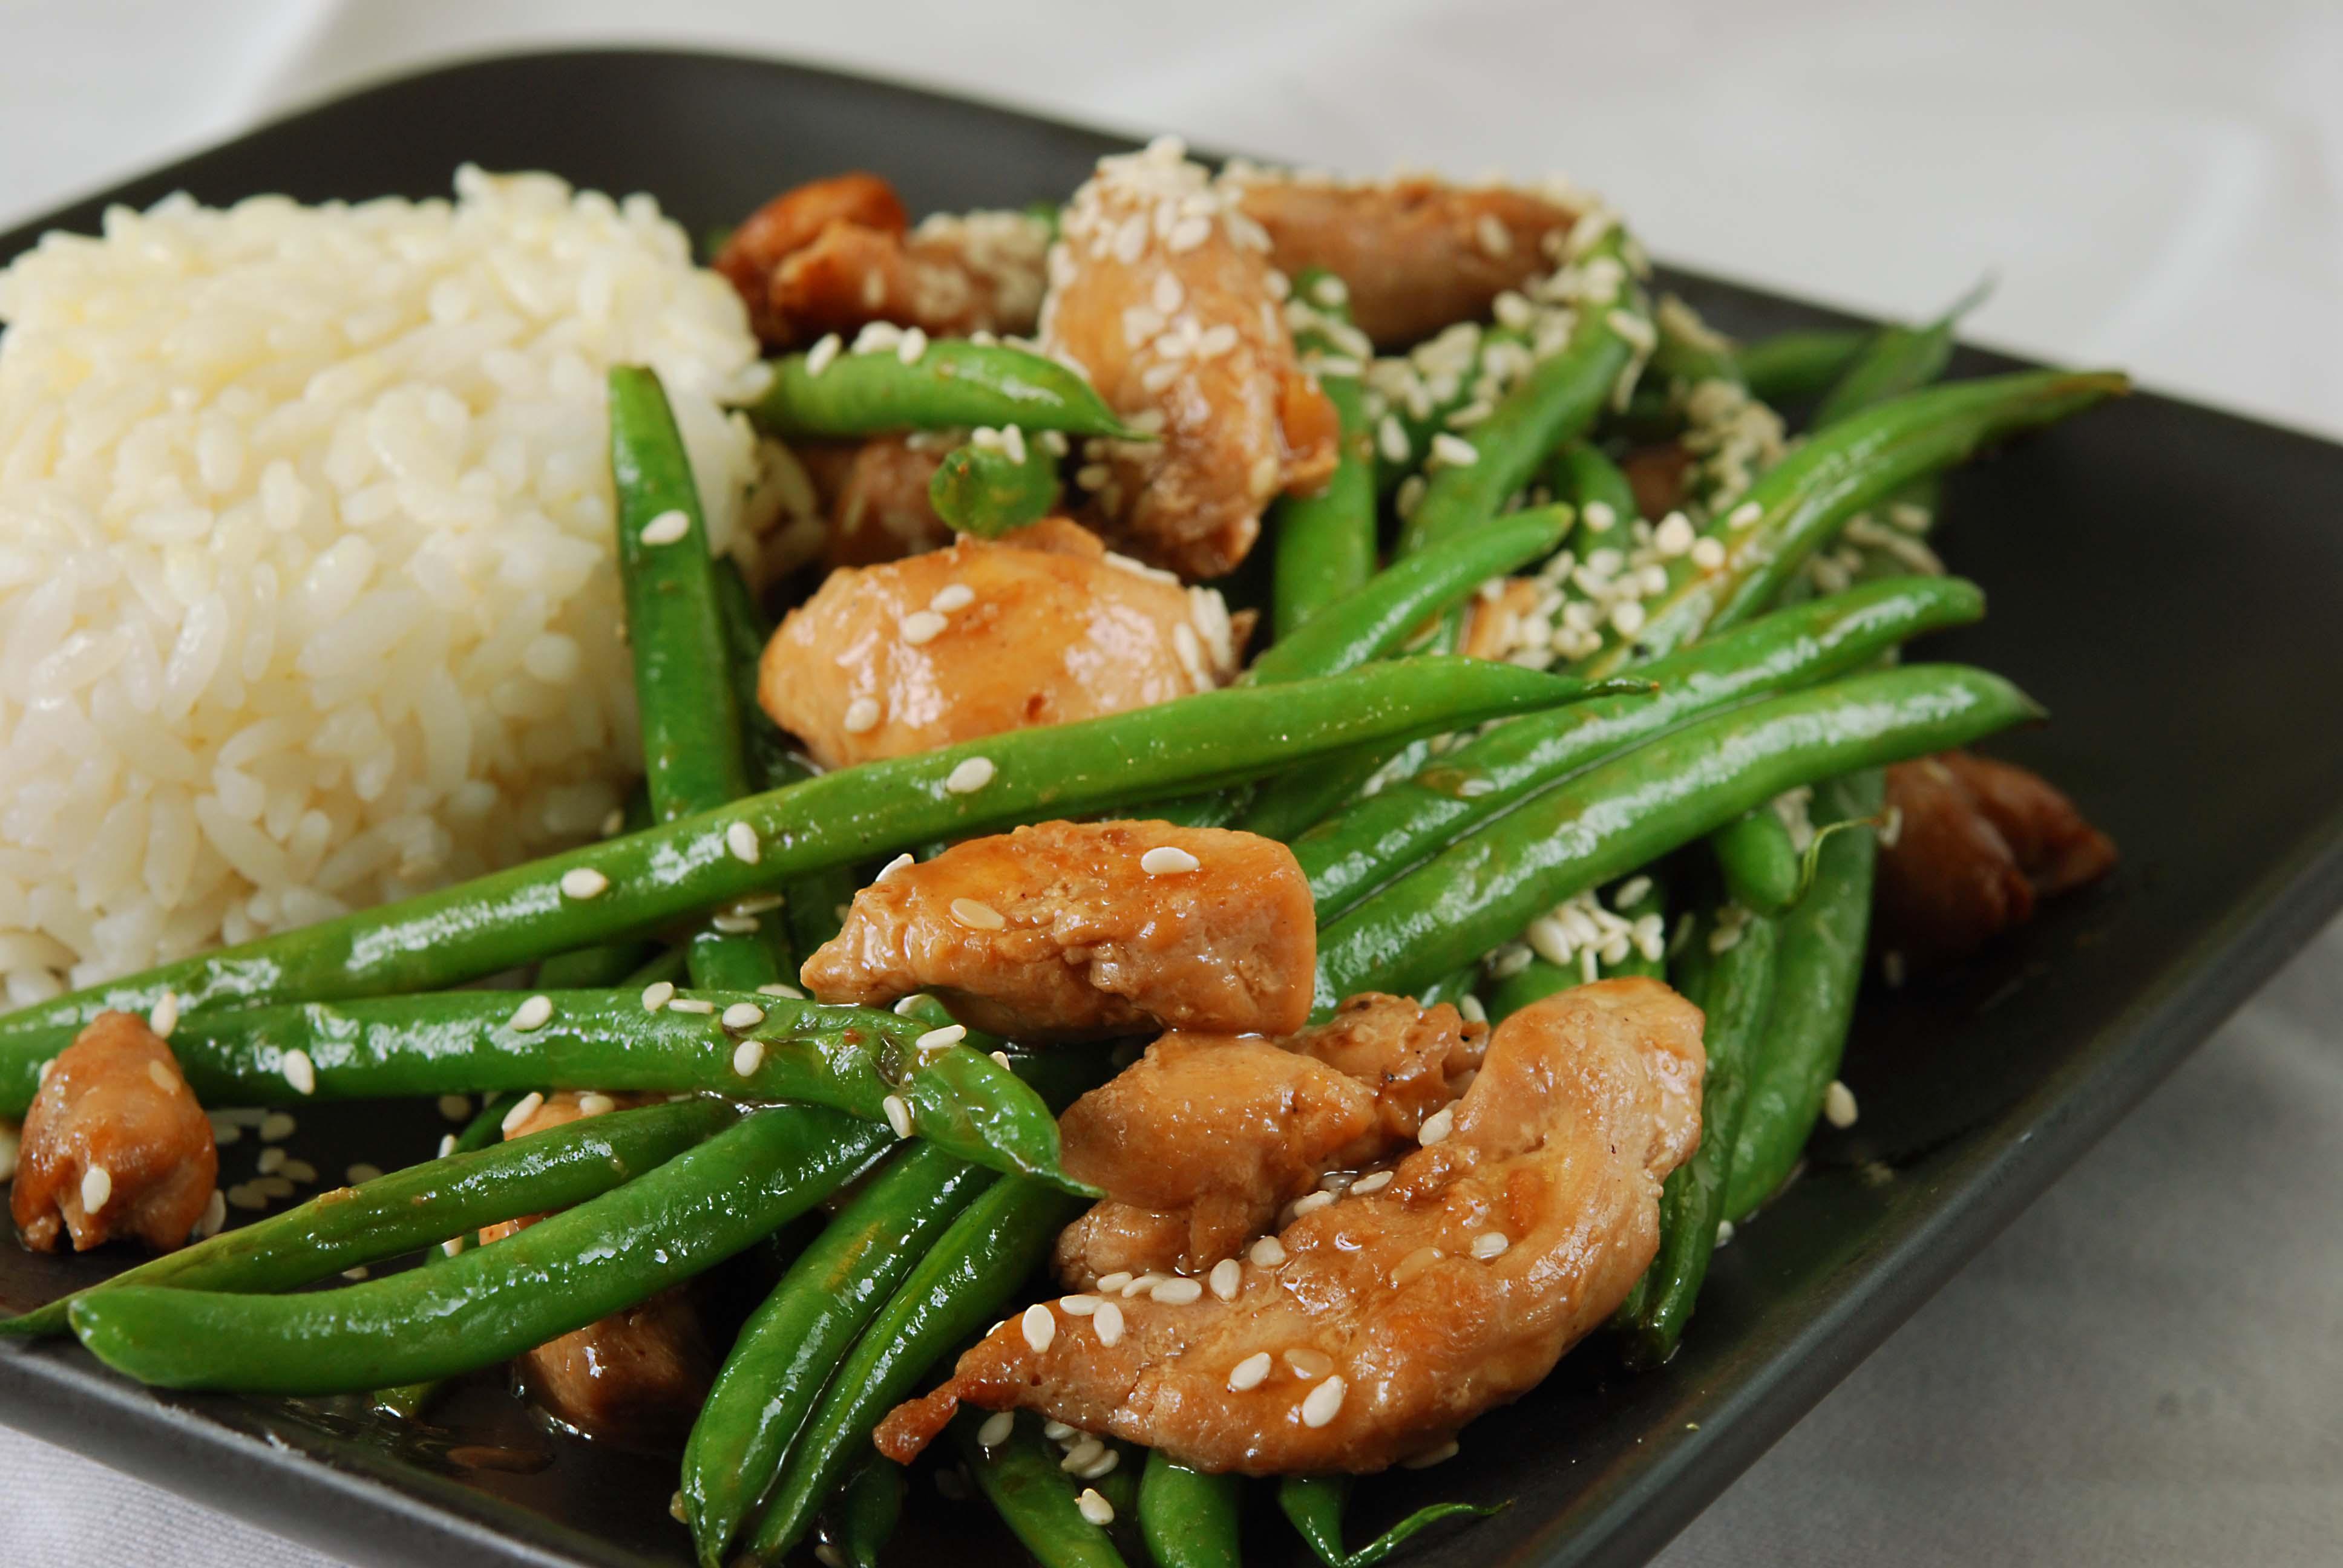 Pork And String Bean Stir Fry Recipe — Dishmaps